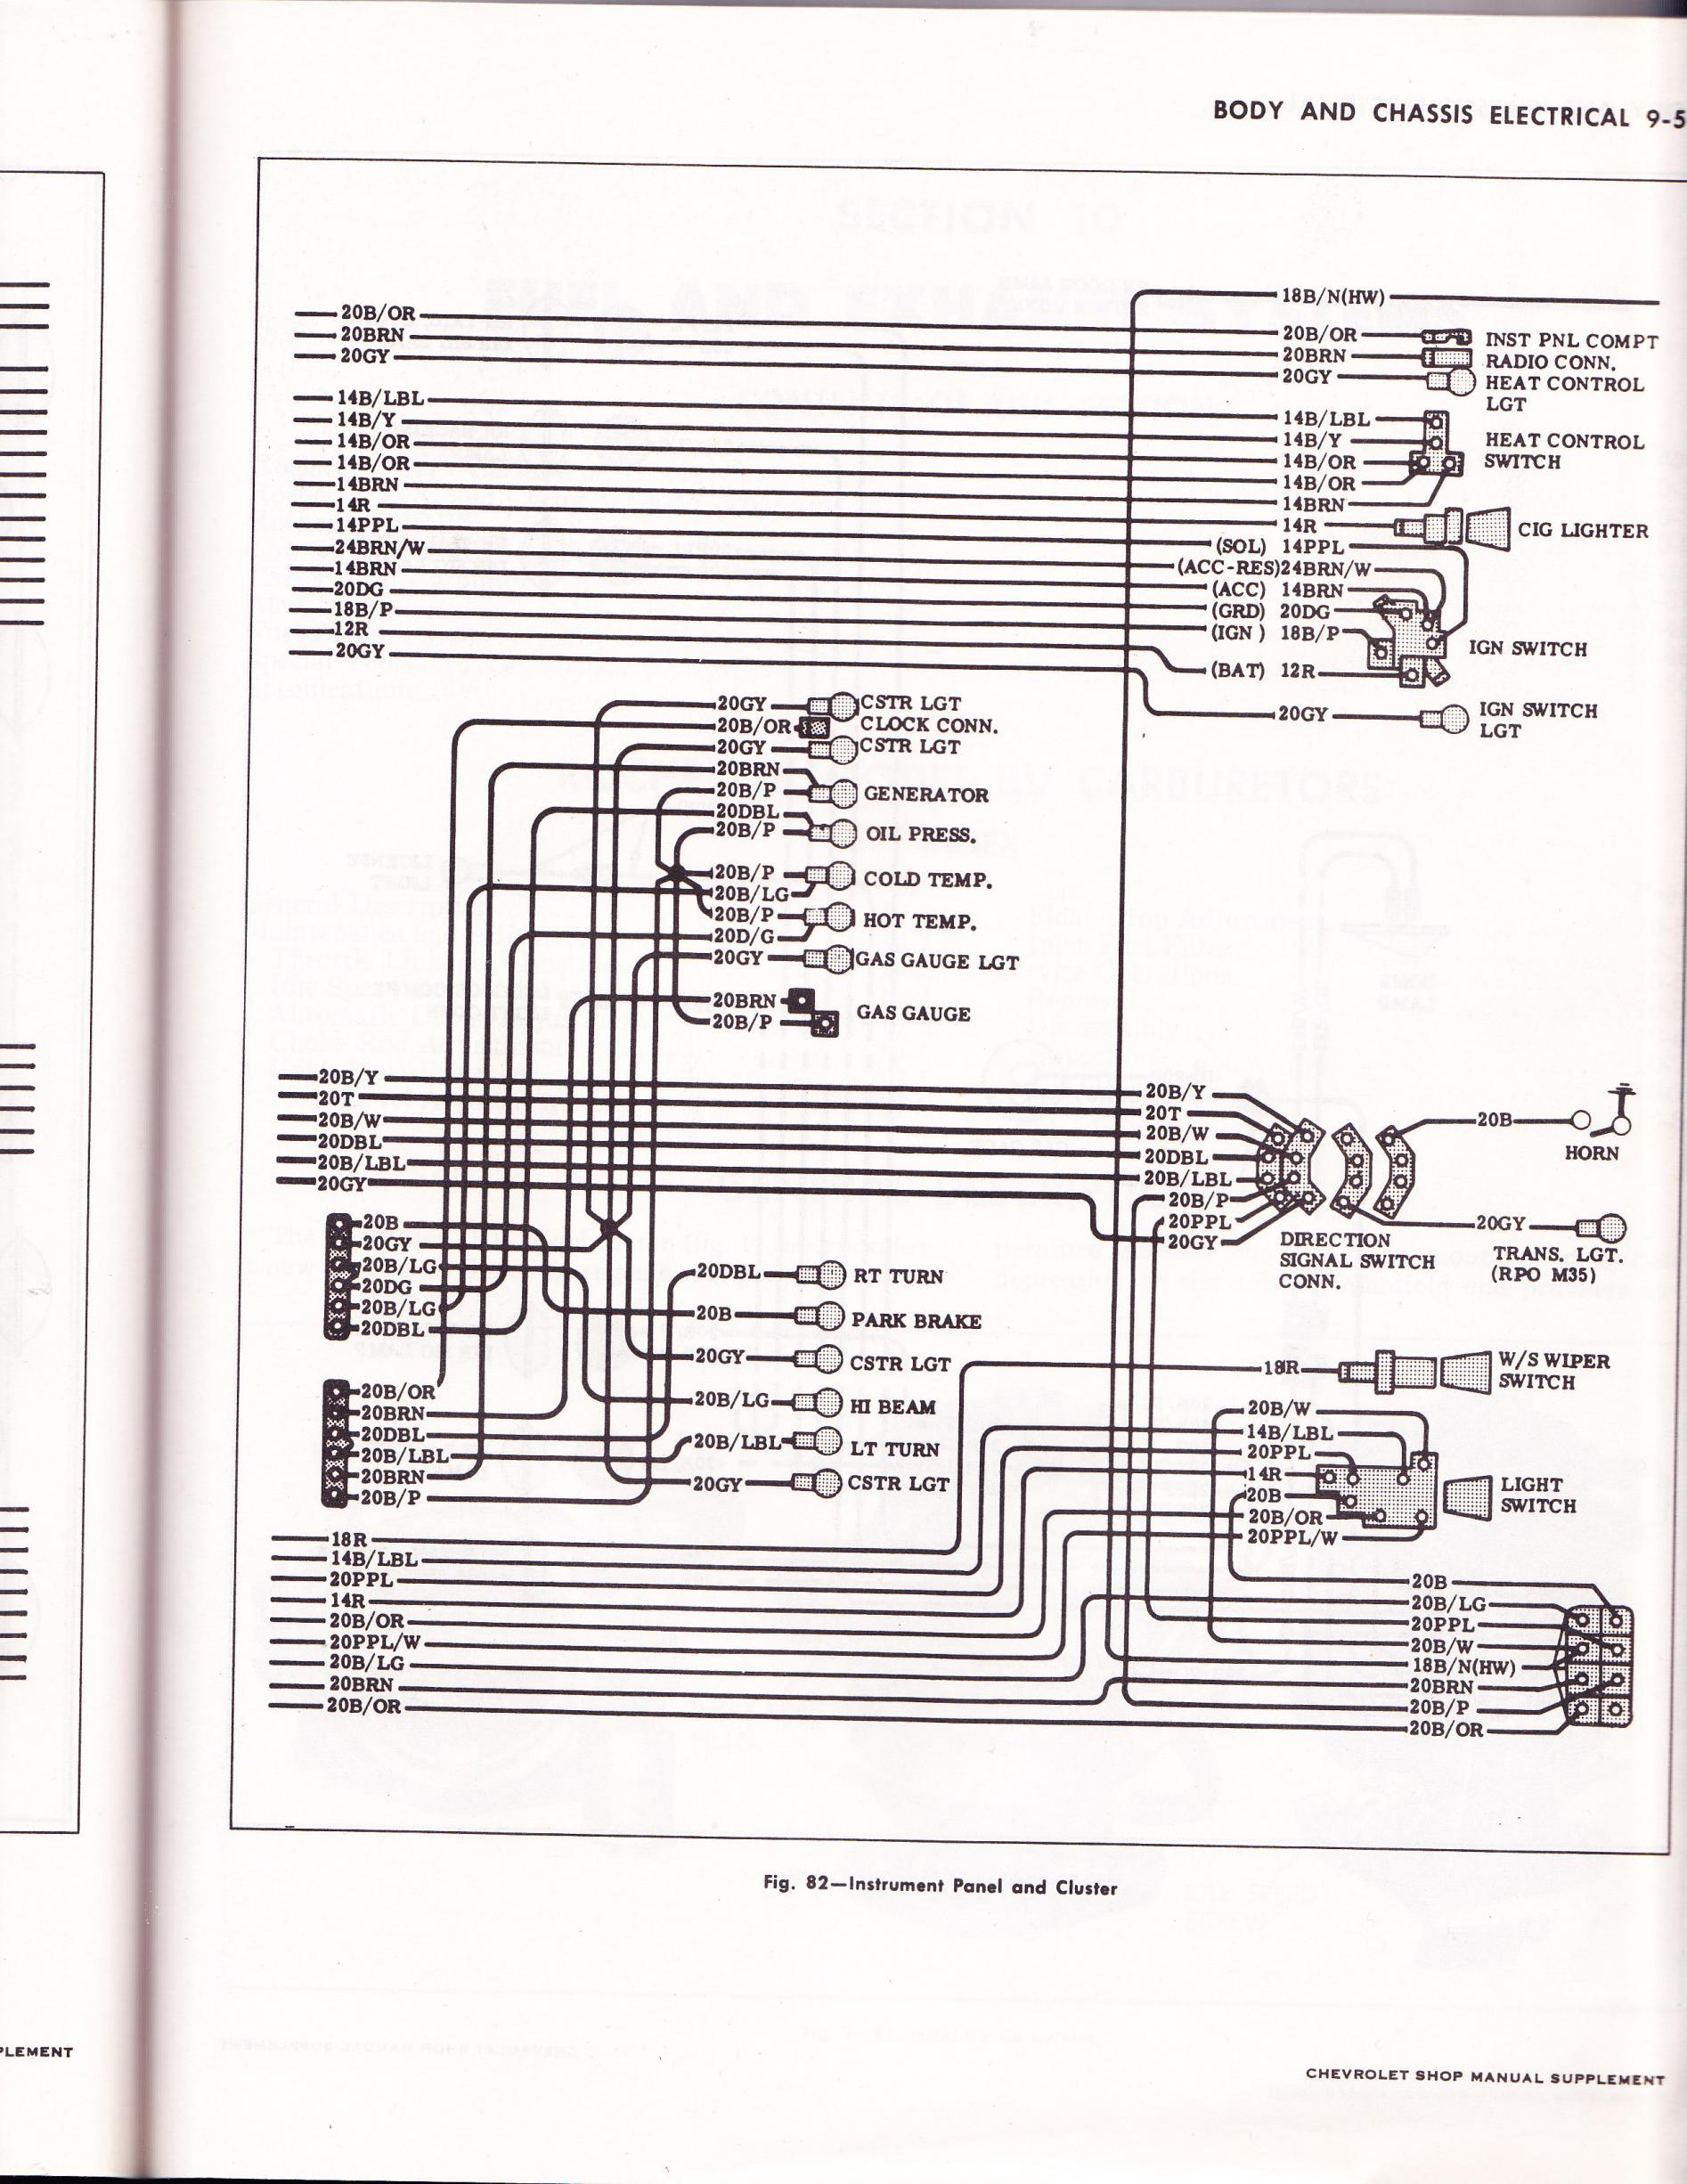 1970 impala fuse box panel diagram